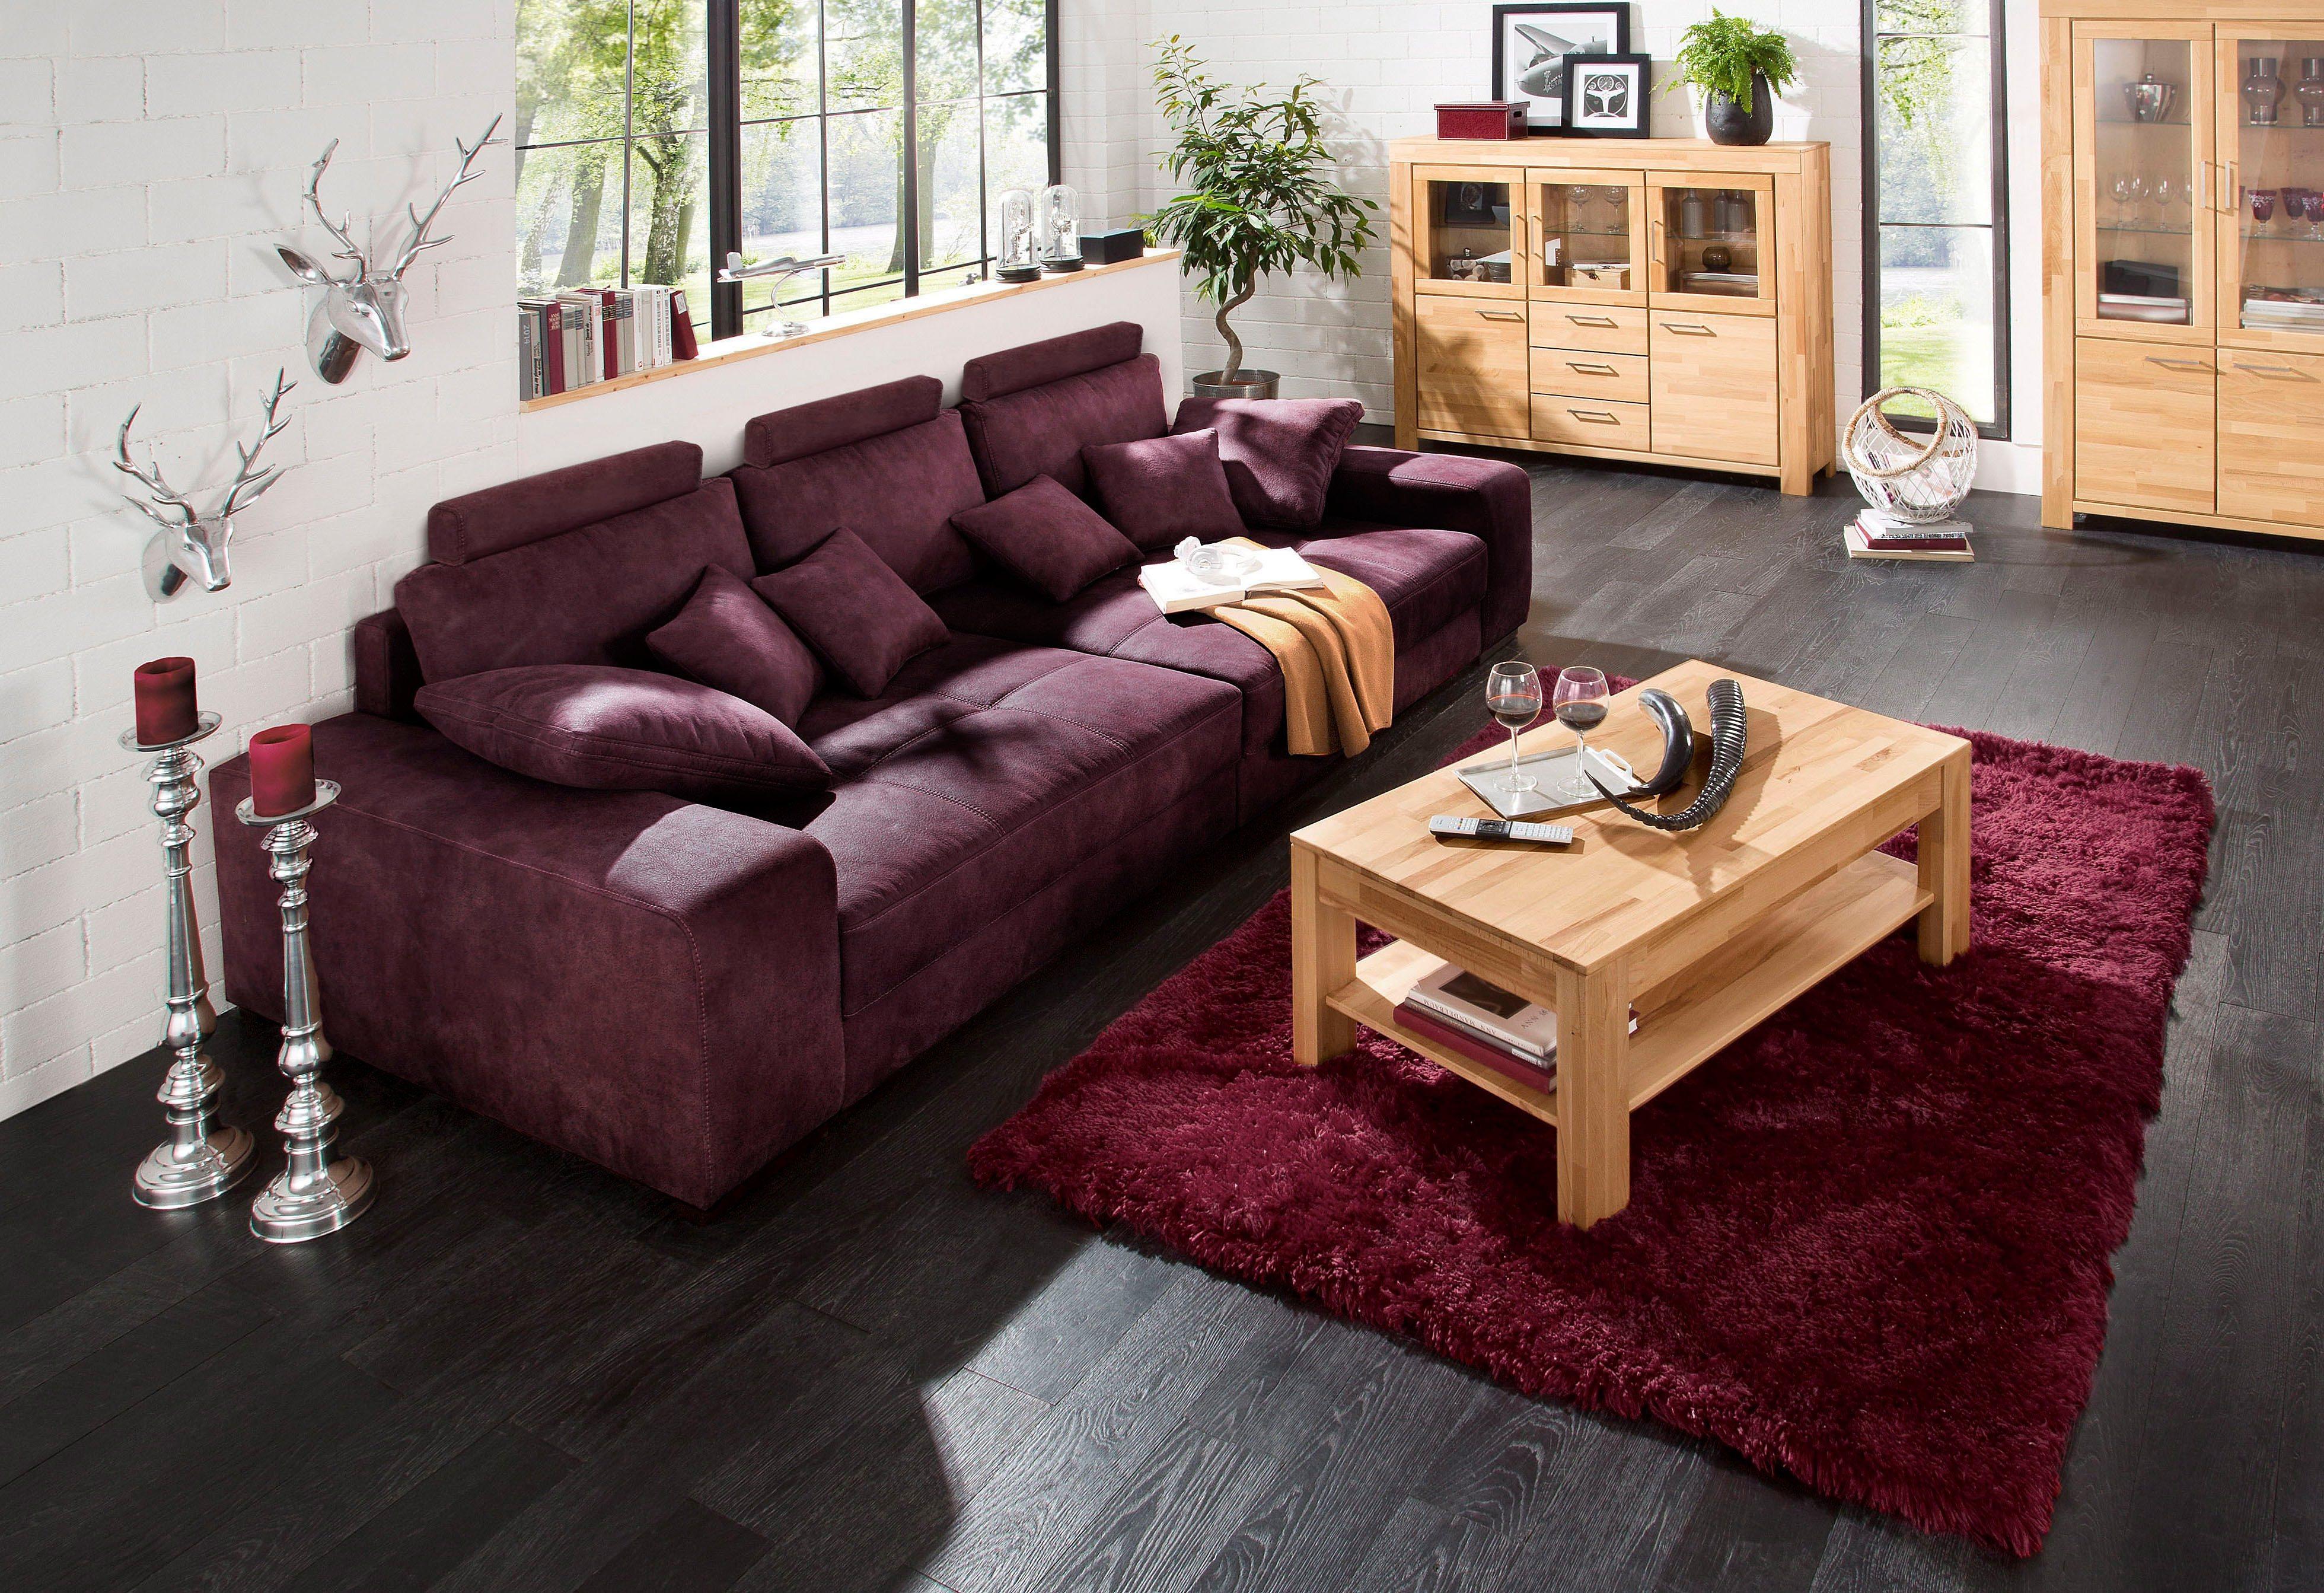 45 sparen big sofa diabolo von home affaire premium collection ab cherry m bel otto. Black Bedroom Furniture Sets. Home Design Ideas